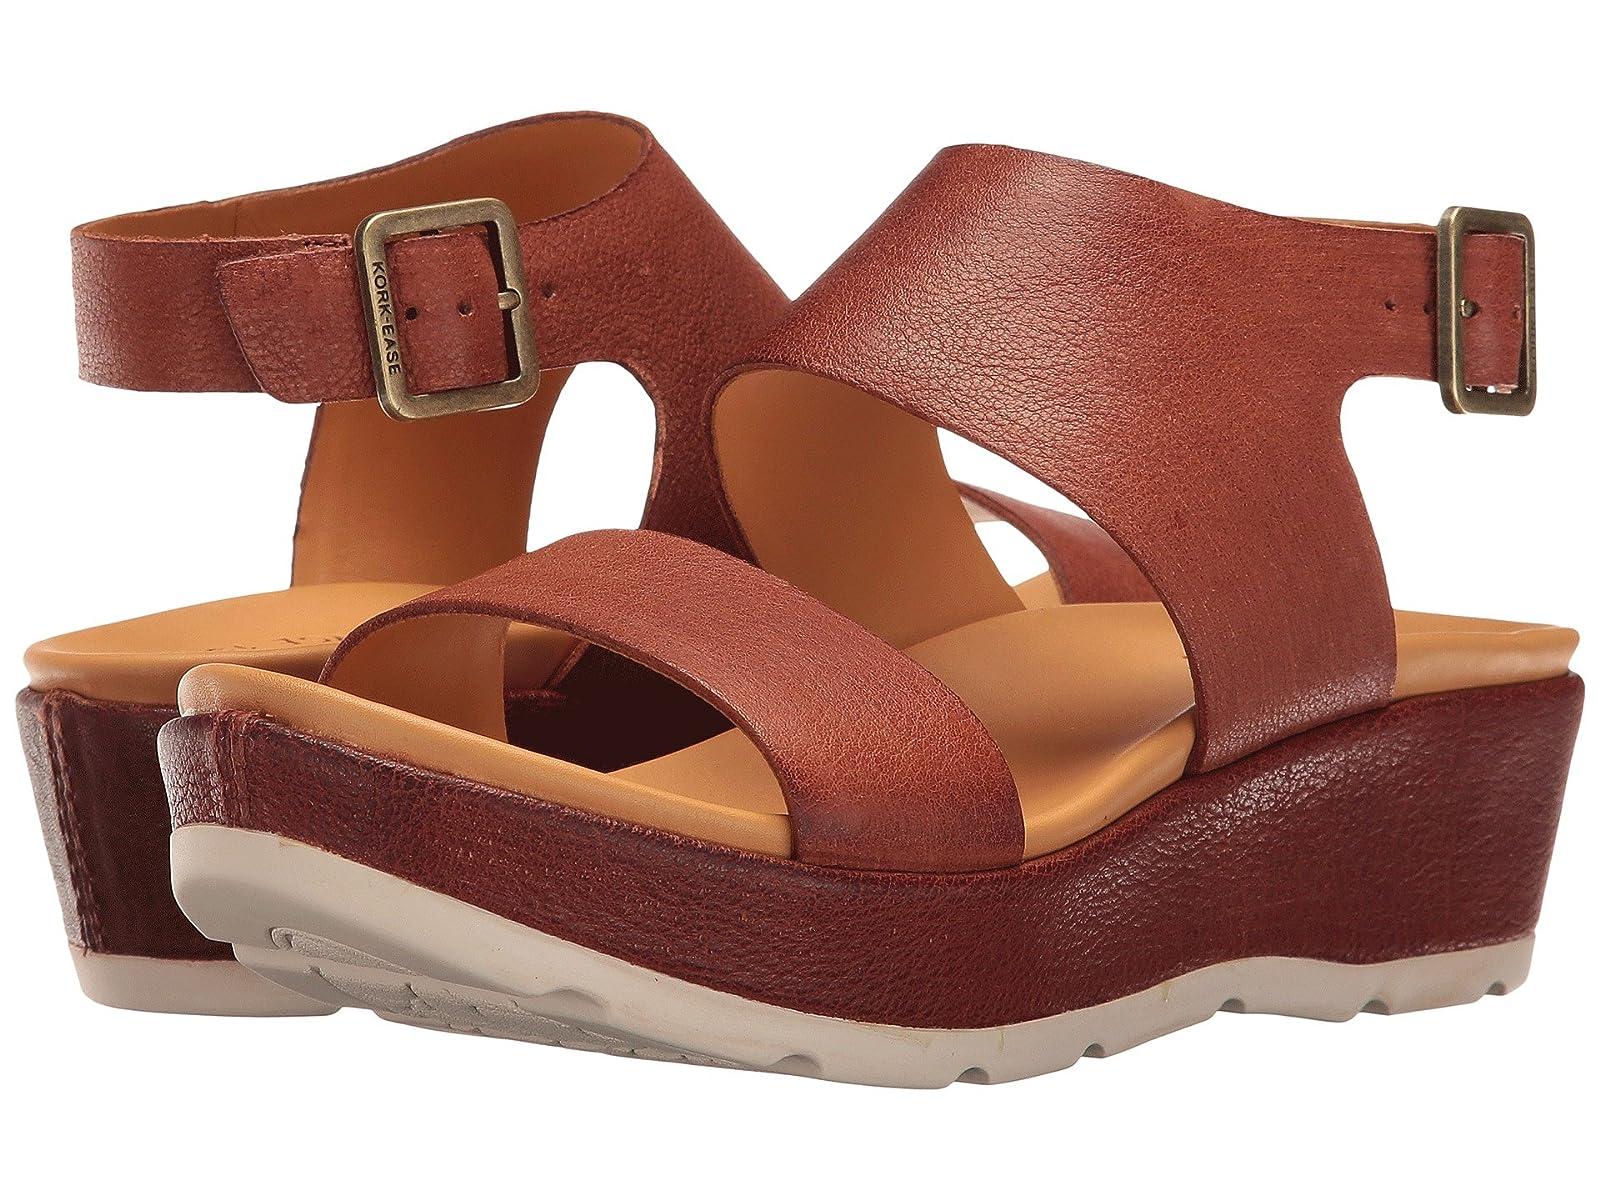 Kork-Ease KhloeCheap and distinctive eye-catching shoes